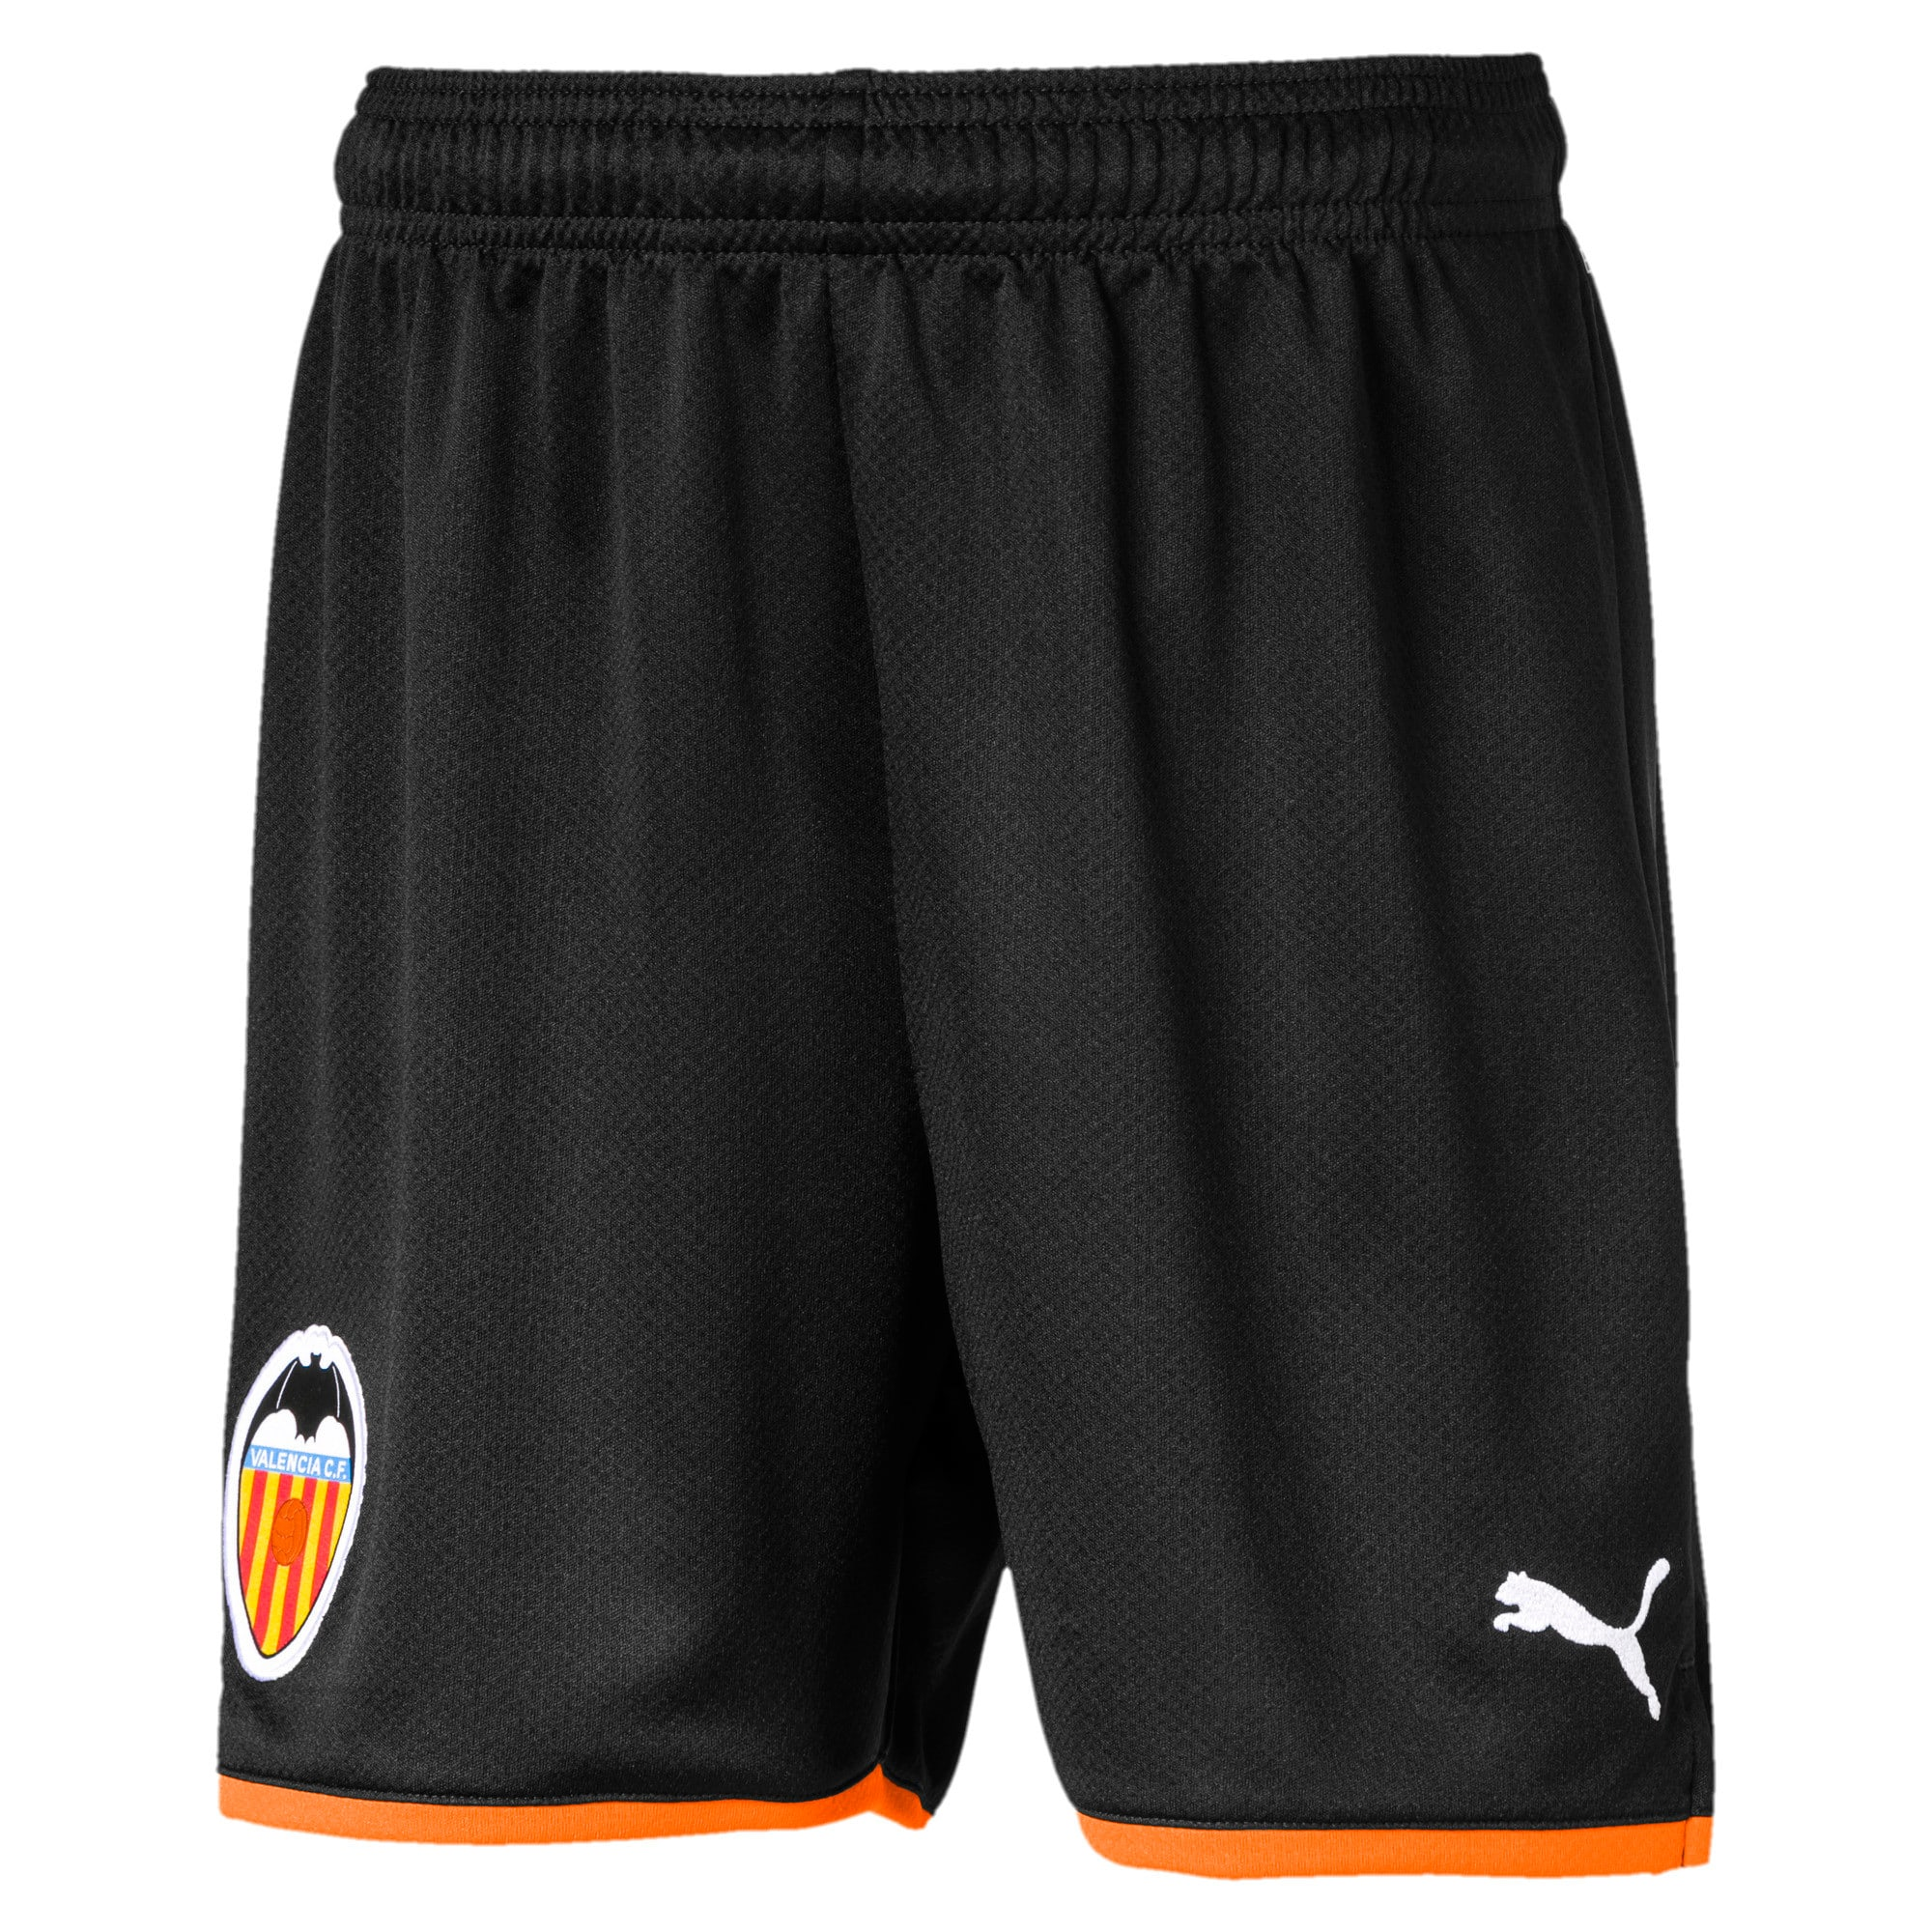 Thumbnail 1 of Valencia CF Boys' Replica Shorts, Puma Black-Vibrant Orange, medium